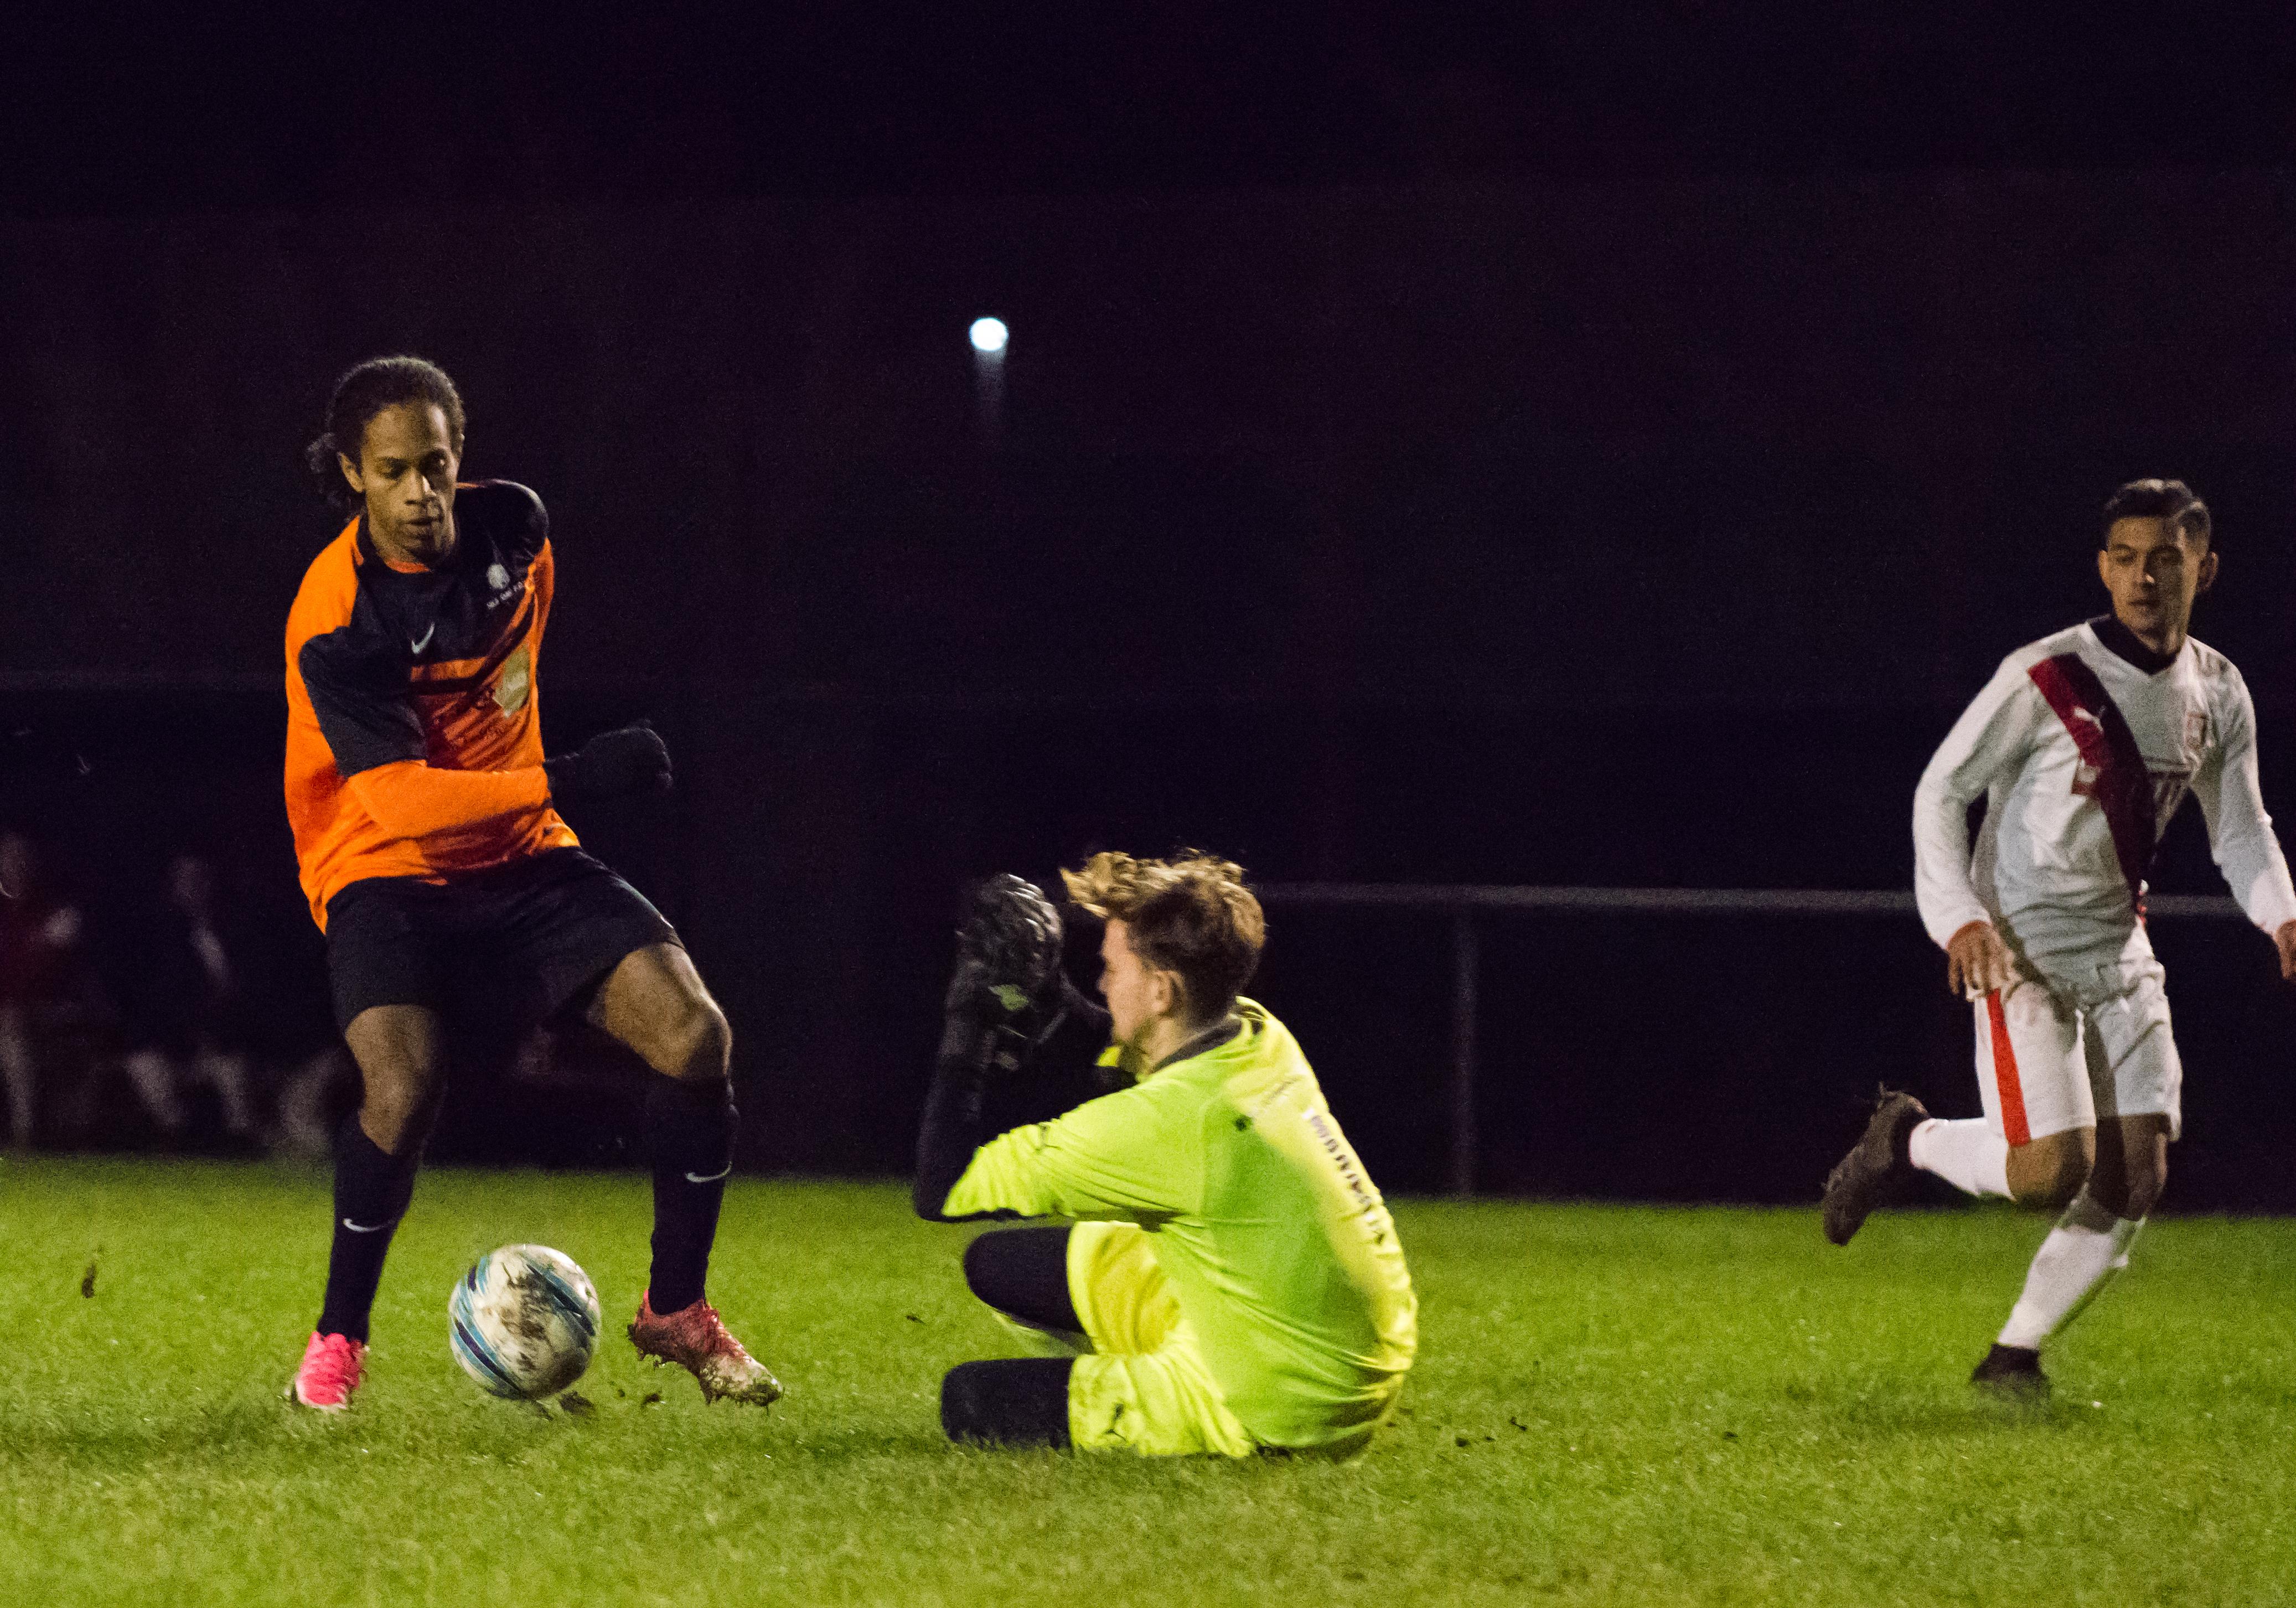 Mile Oak U21s vs Southwick FC U21s 14.12.17 03